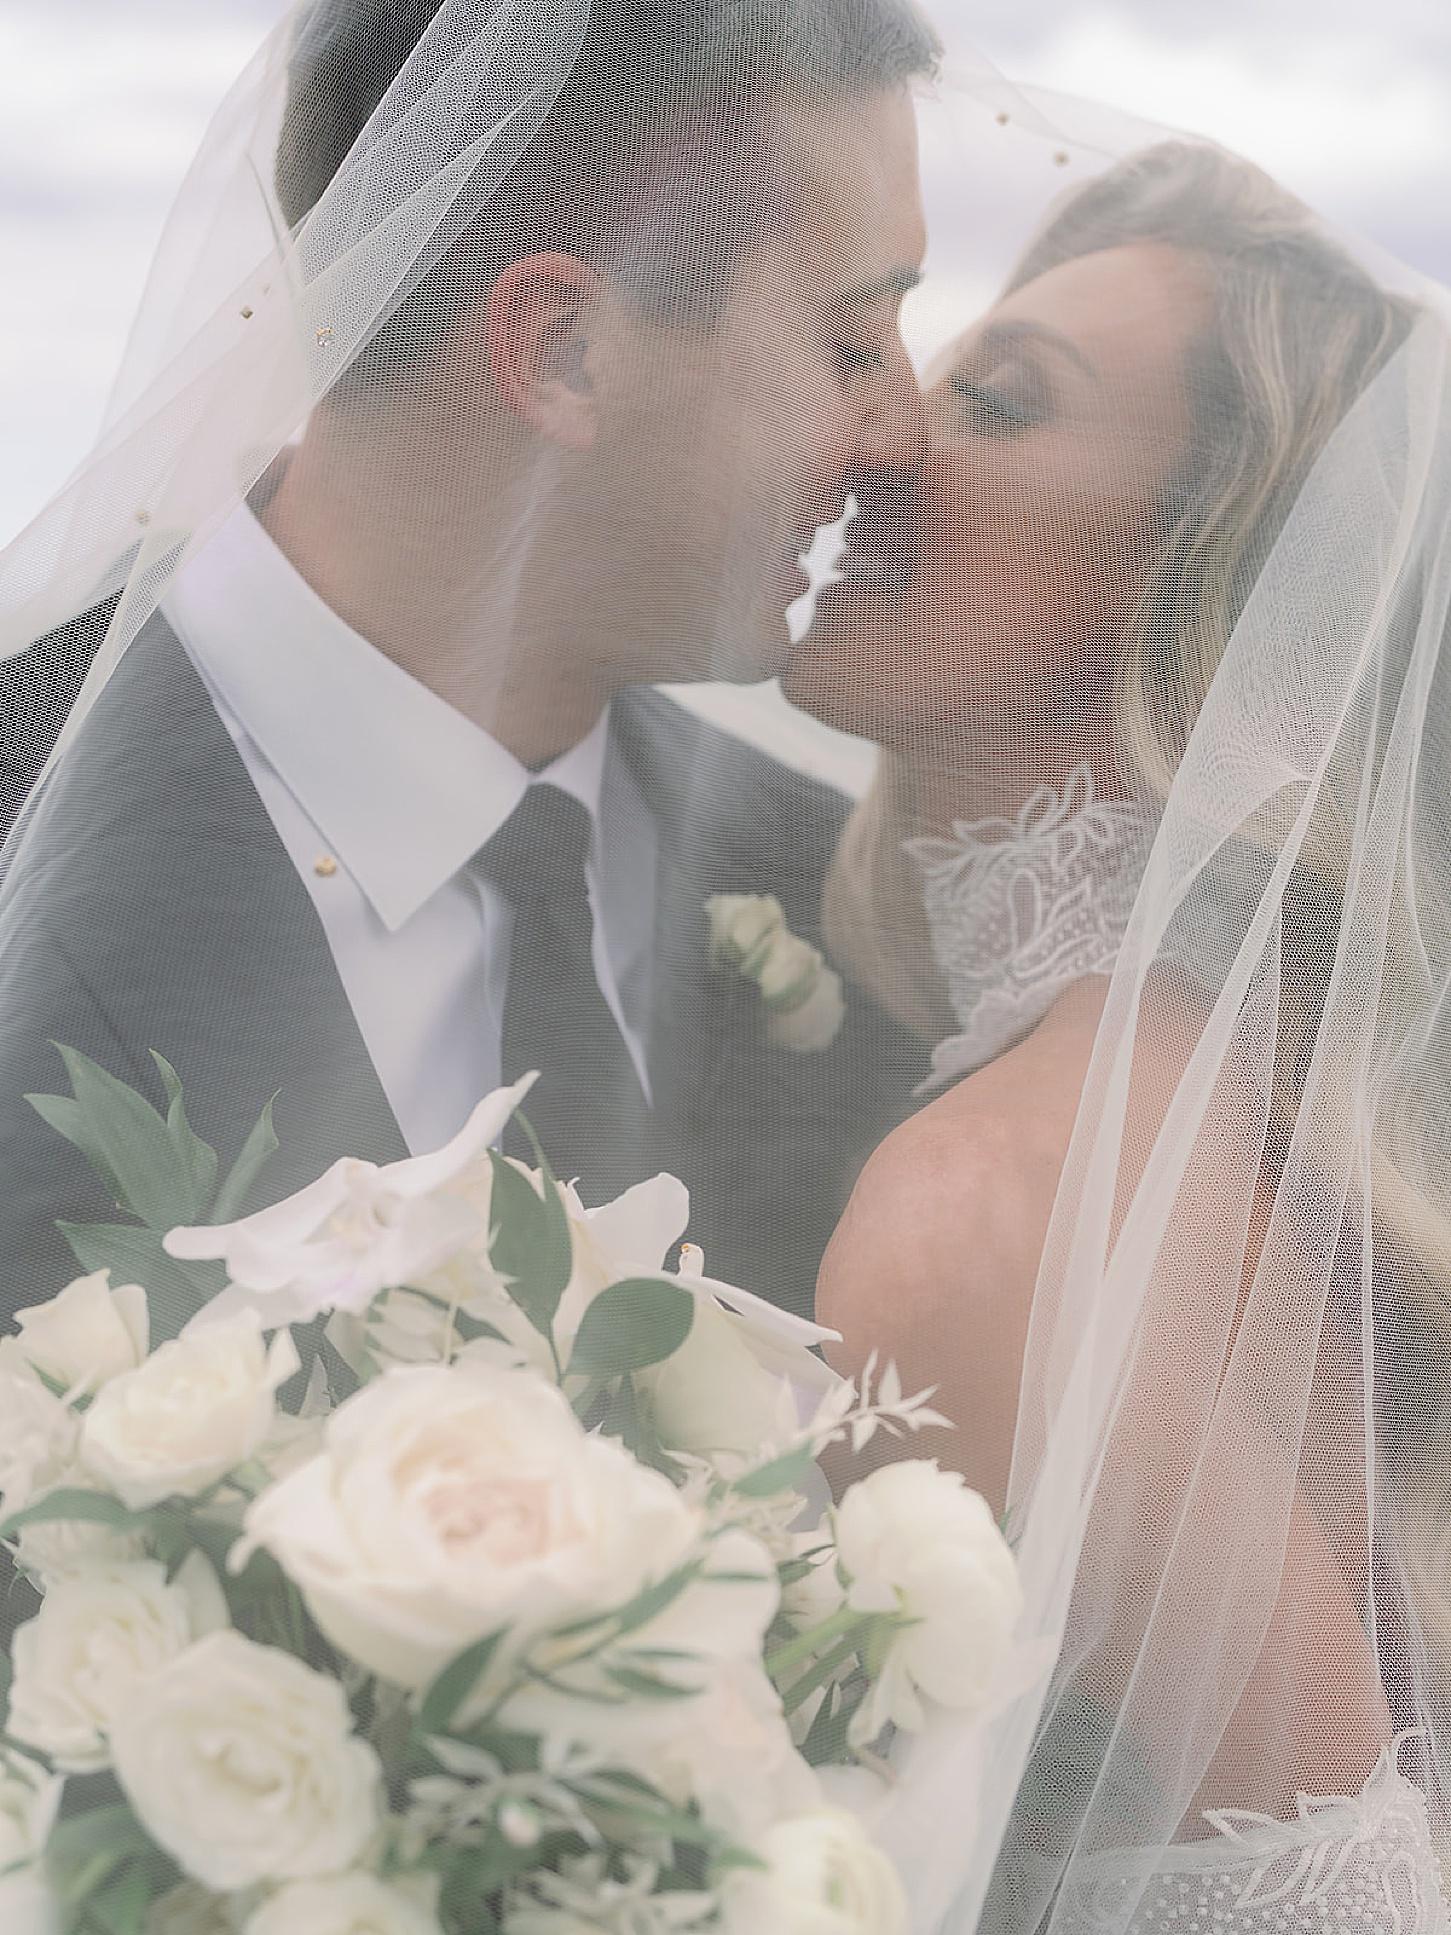 Atlantic City Wedding Photography Studio by Magdalena Studios Lexy Cha 0048